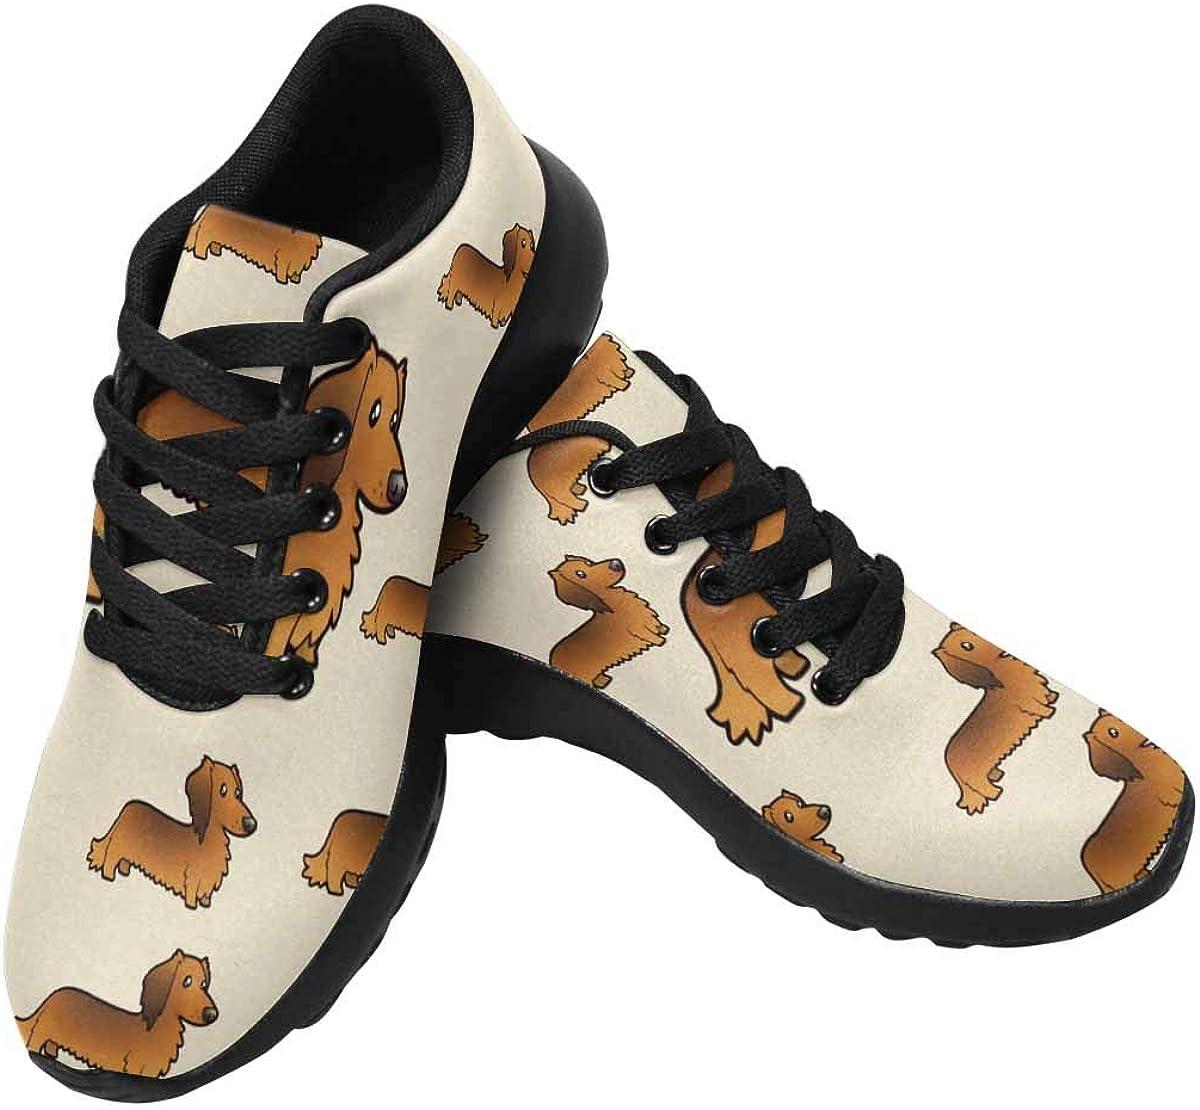 InterestPrint Women's Cross Trainer Trail Running Sneakers